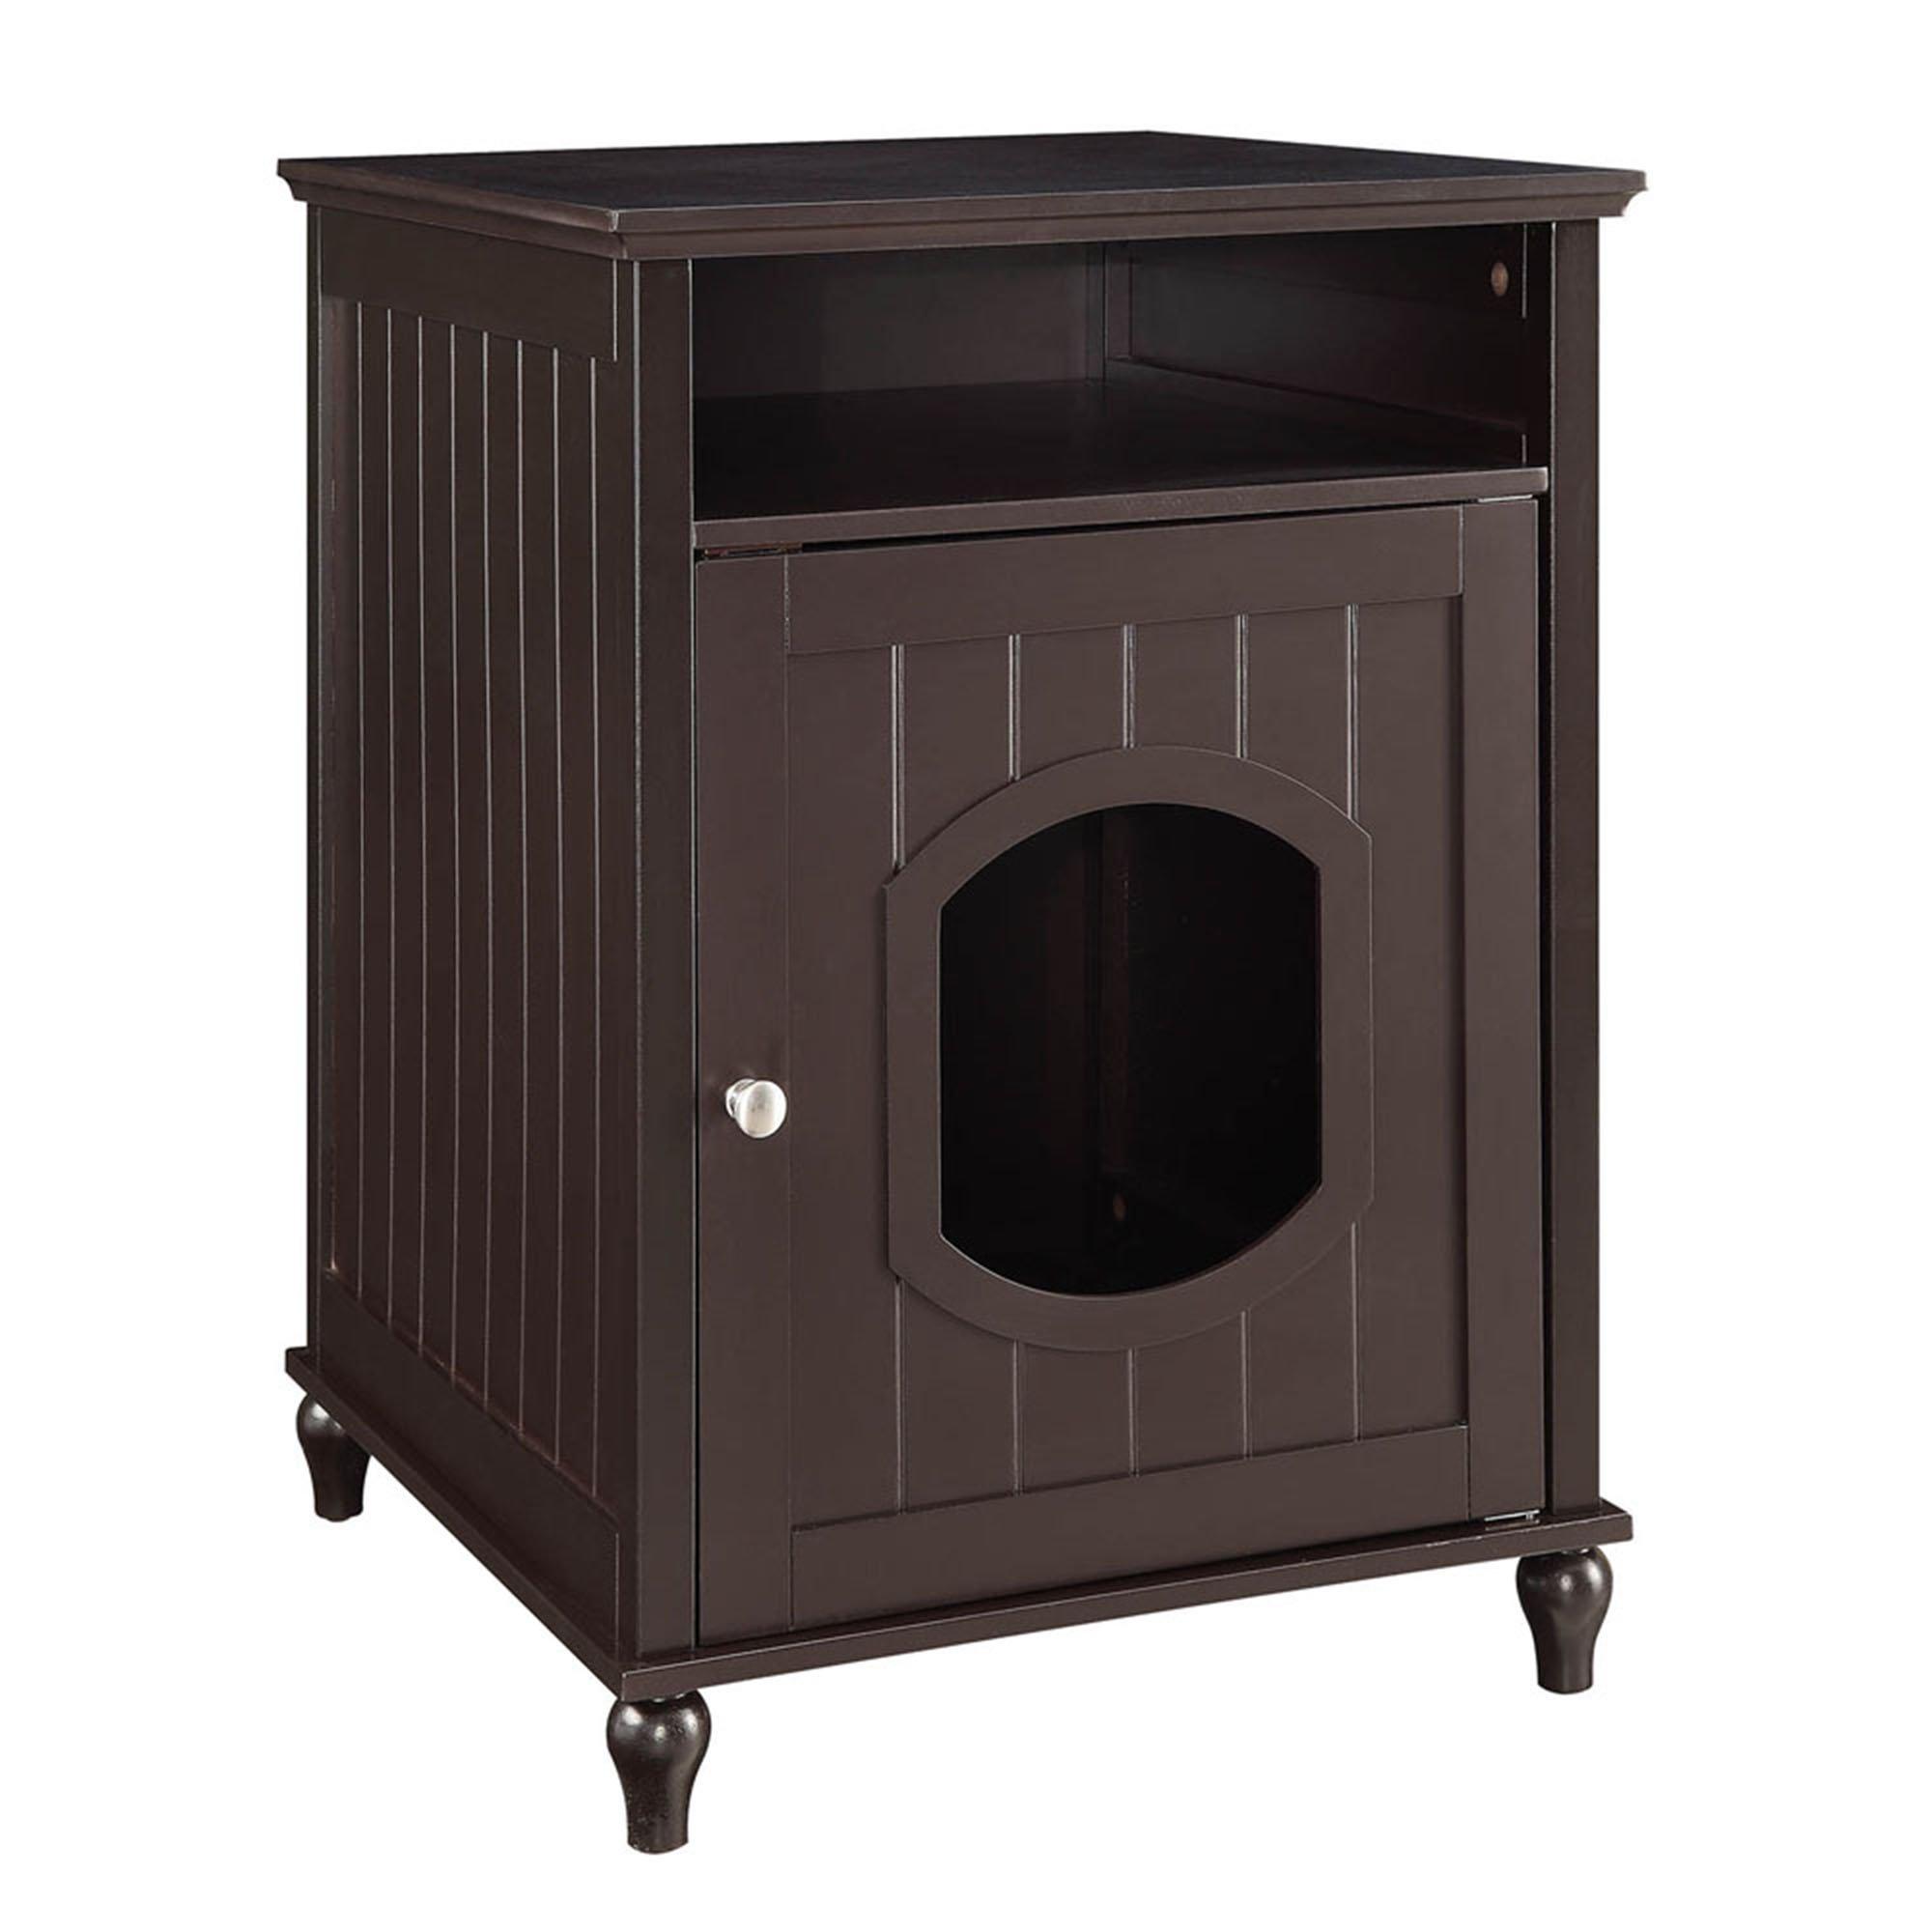 Unipaws Espresso Wooden Litter Box Cat Furniture 19 1 L X 20 87 W X 26 77 H Petco